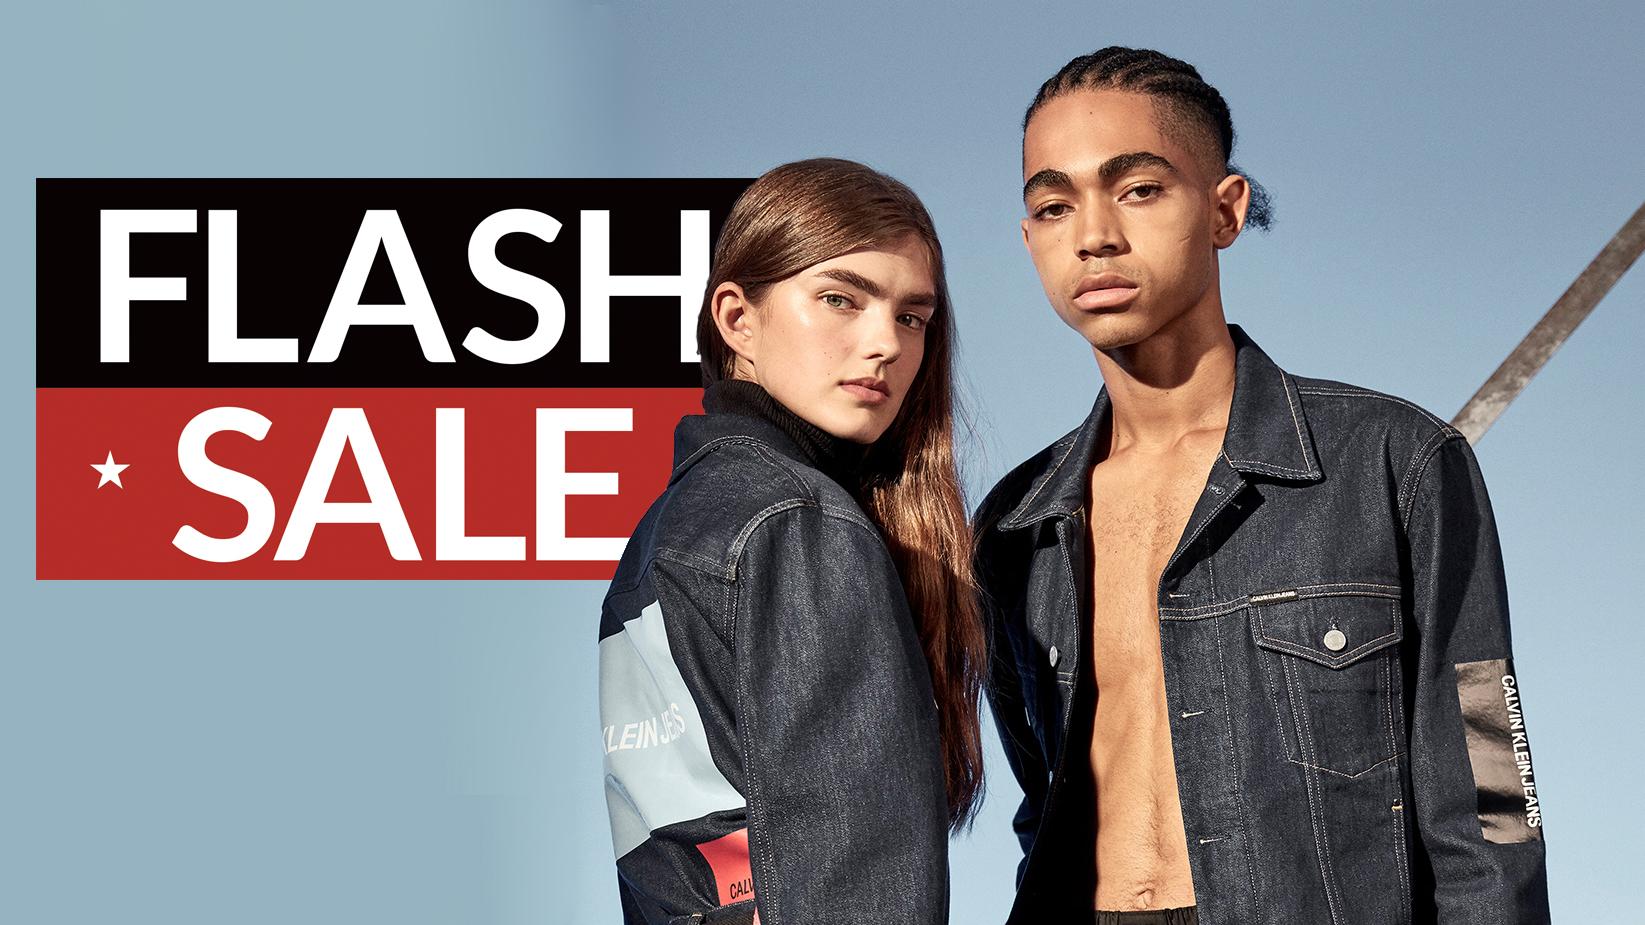 profundo Maravilla aeropuerto  Calvin Klein sale: it's Prime Day for clothing in Amazon's Big Style Sale |  T3